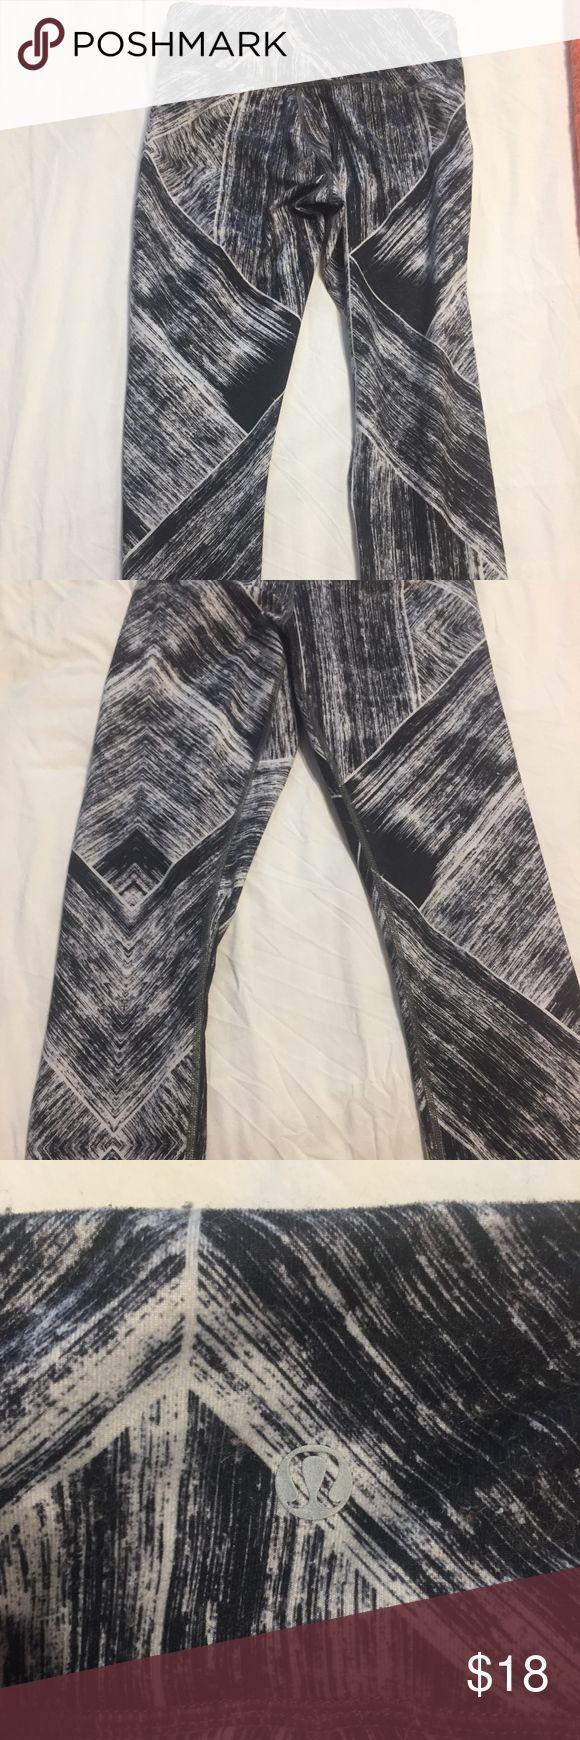 Lululemon patterned leggings Black, grey and white capri leggings, mid-rise. Have been worn but in good condition. Tag cut off. lululemon athletica Pants Leggings